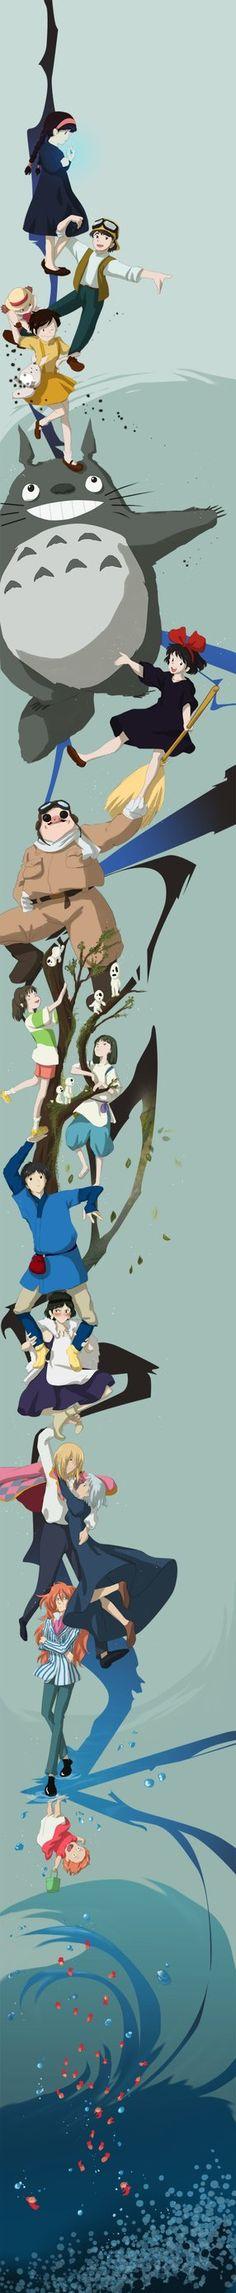 Durarara Trust Me: Miyazaki by ~Mikomi-sama on deviantART